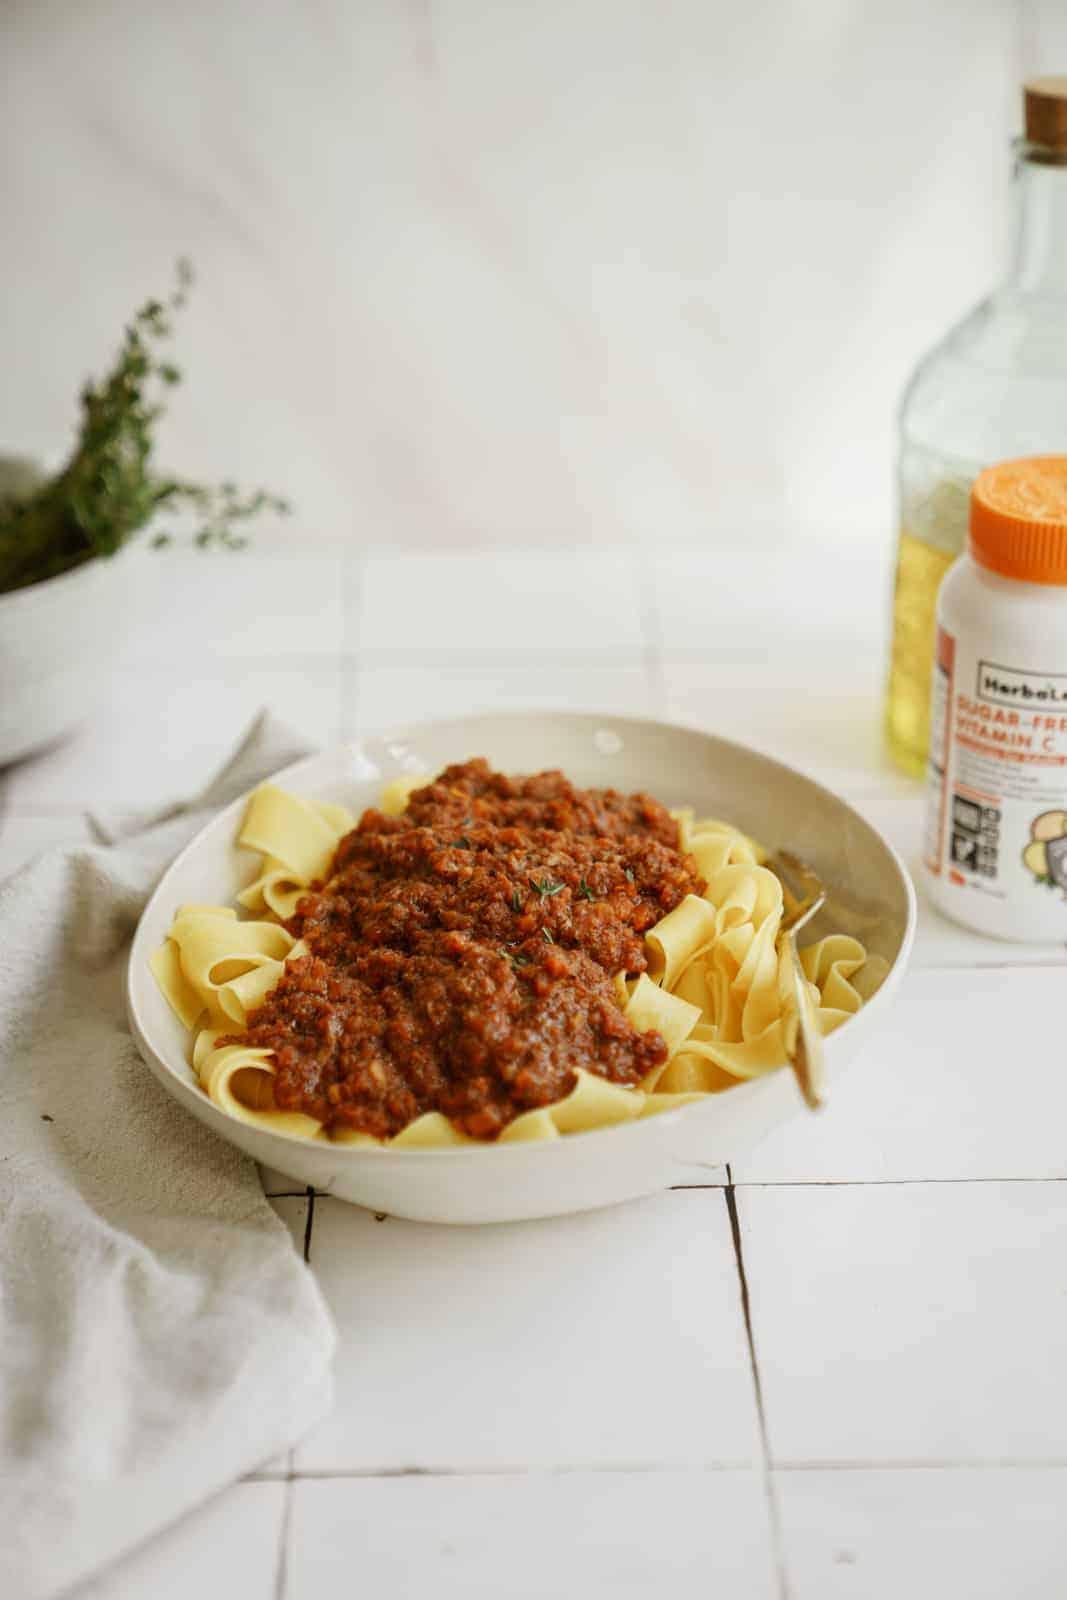 Vegan ragu in a serving dish on countertop